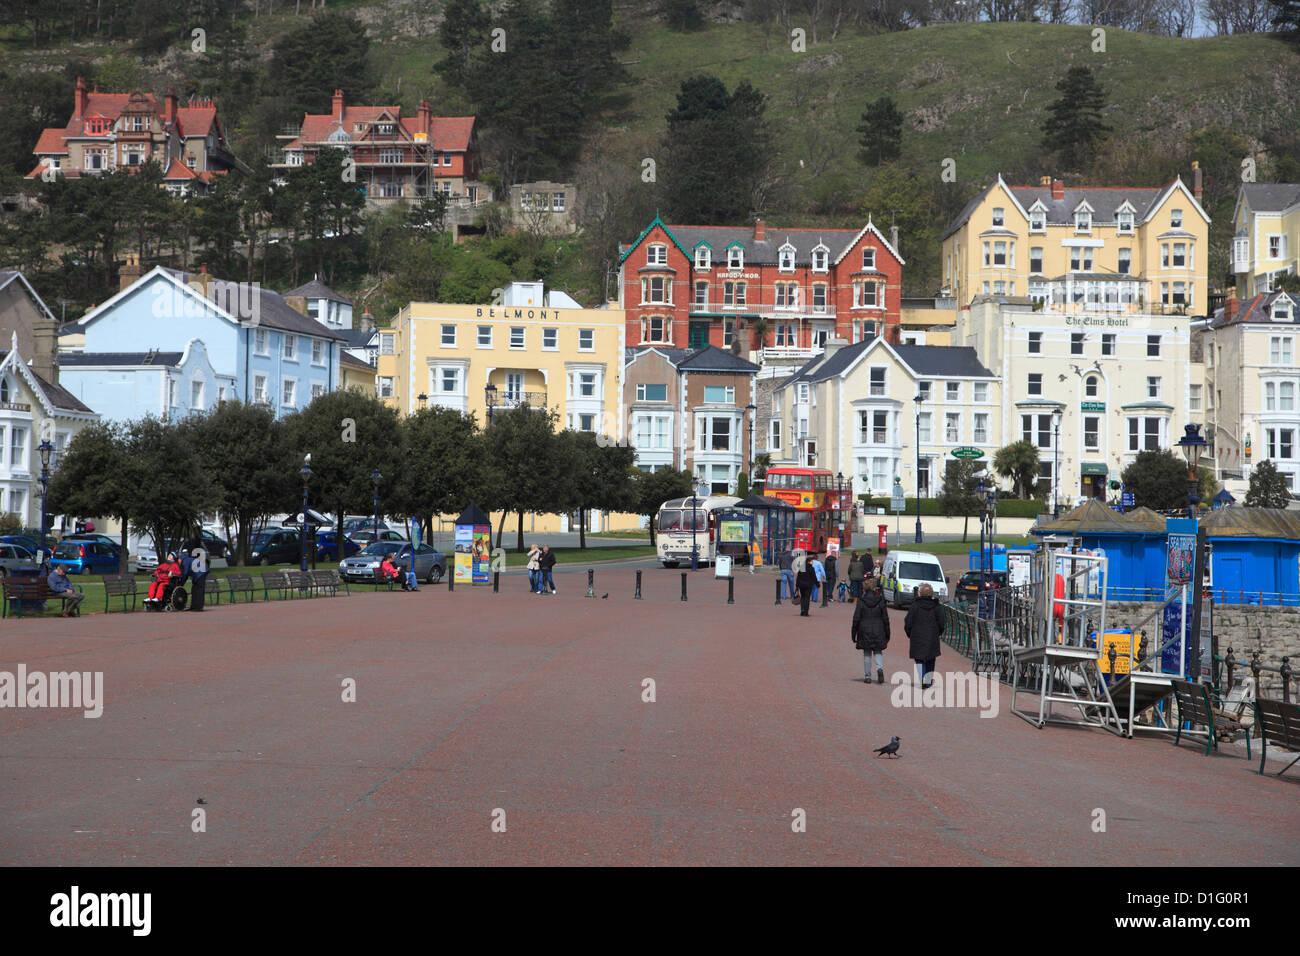 Seaside Promenade, Llandudno, Conwy County, North Wales, Wales, United Kingdom, Europe - Stock Image